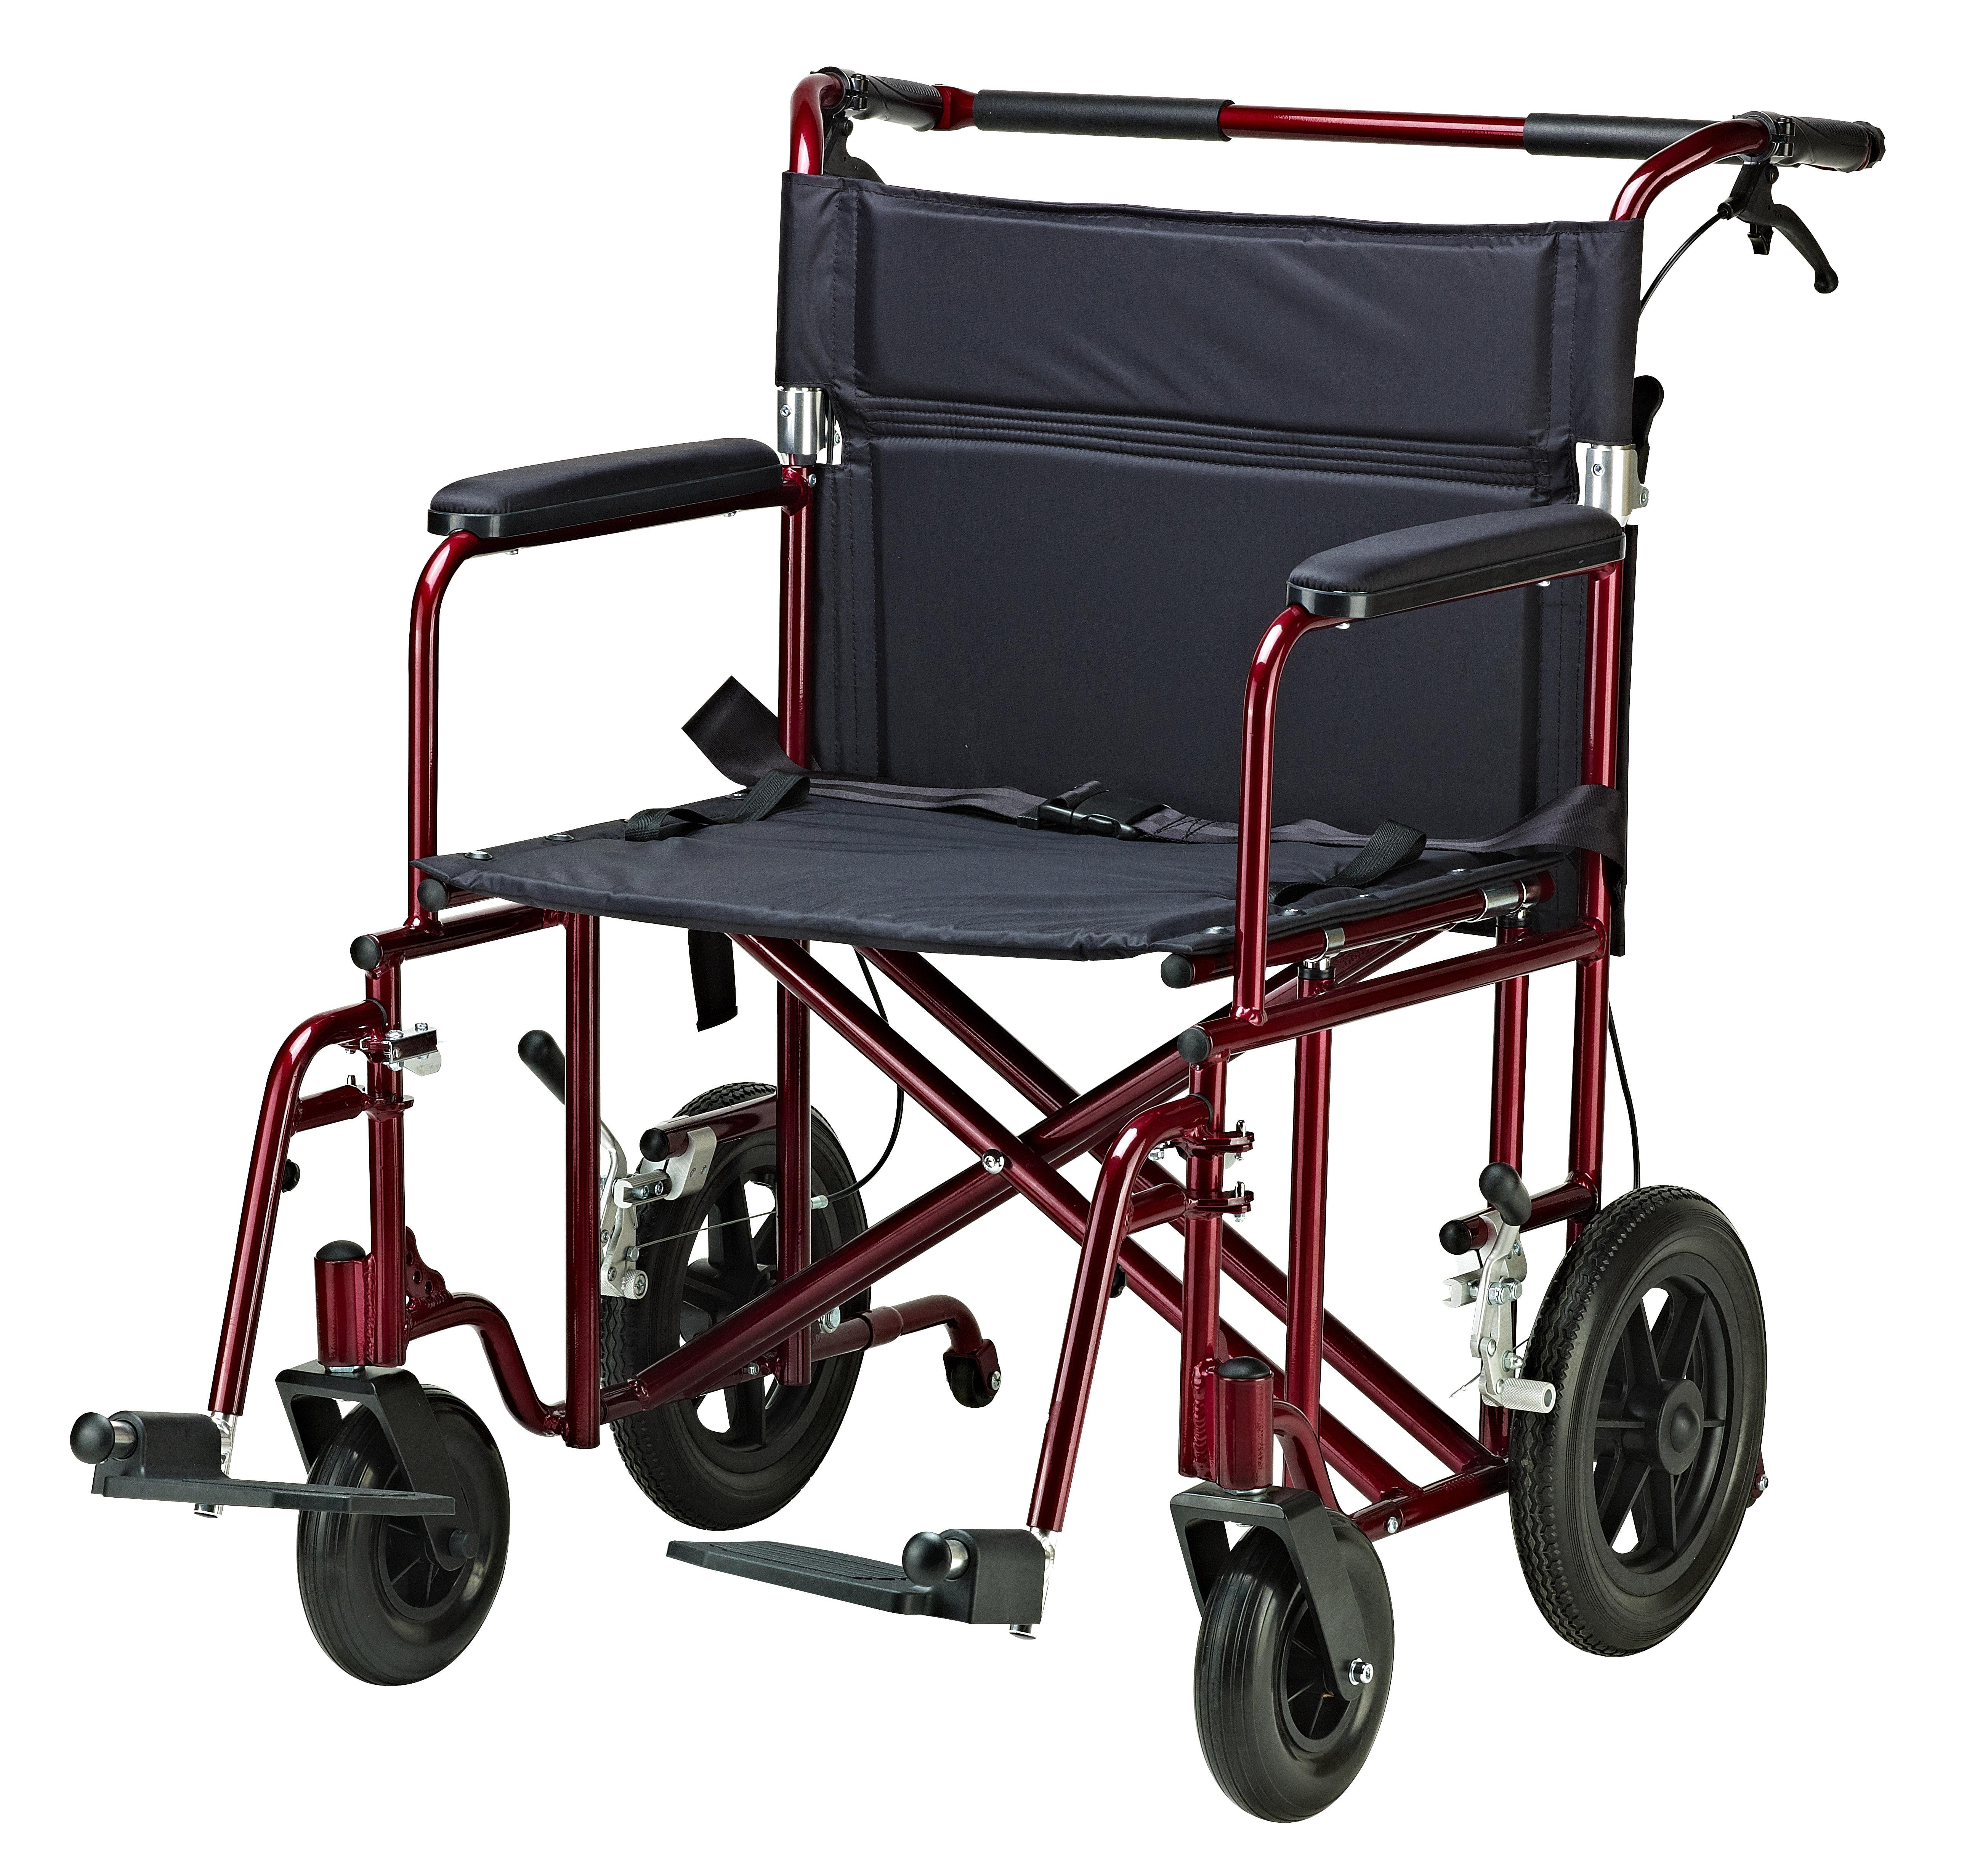 Drive Medical Bariatric Heavy Duty Transport Wheelchair - Walmart.com